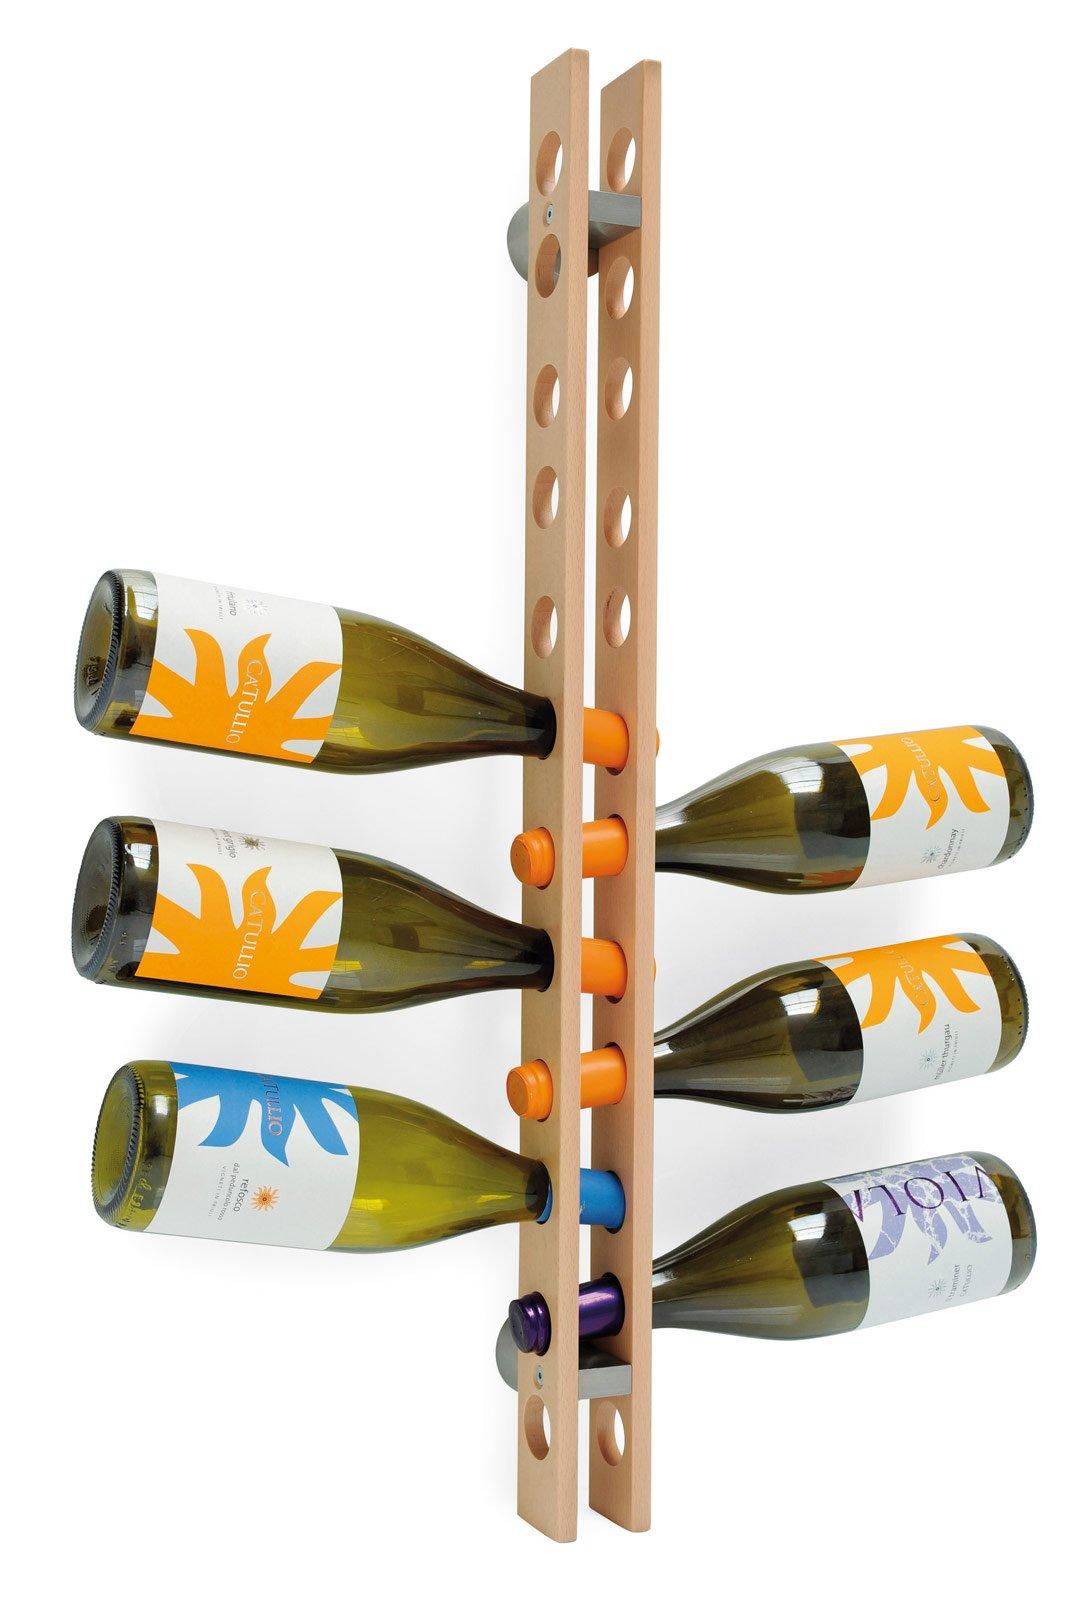 Portabottiglie belli da lasciare a vista cose di casa - Porta bottiglie ikea ...